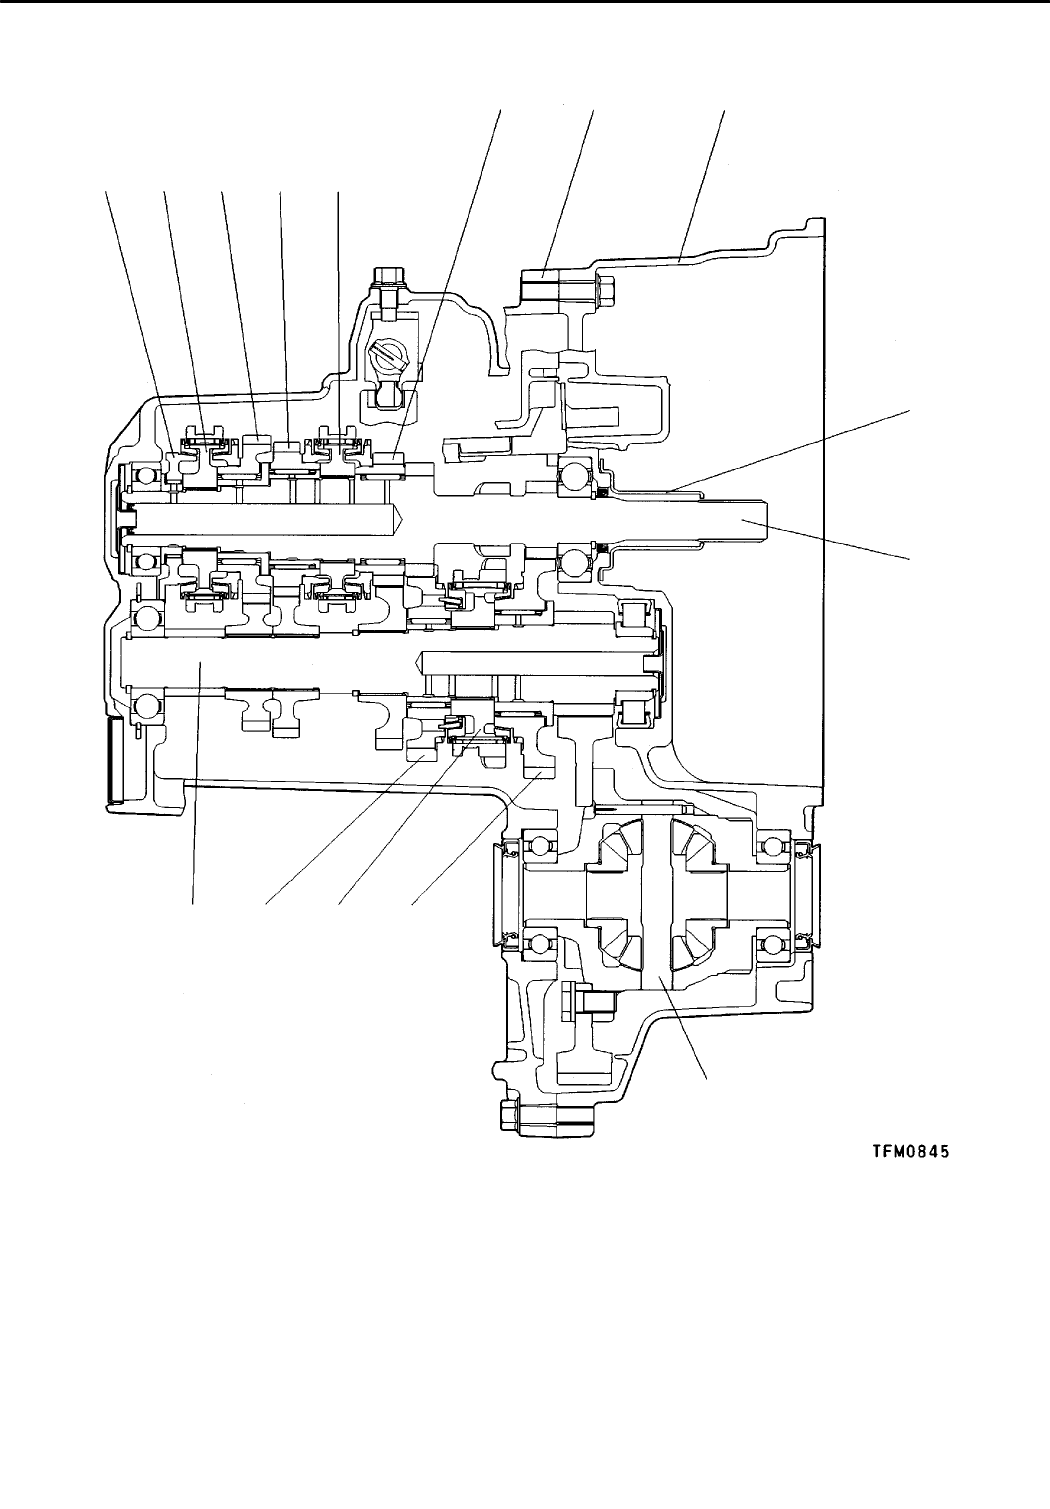 Mitsubishi Motors Automobile Parts F5M41 Users Manual